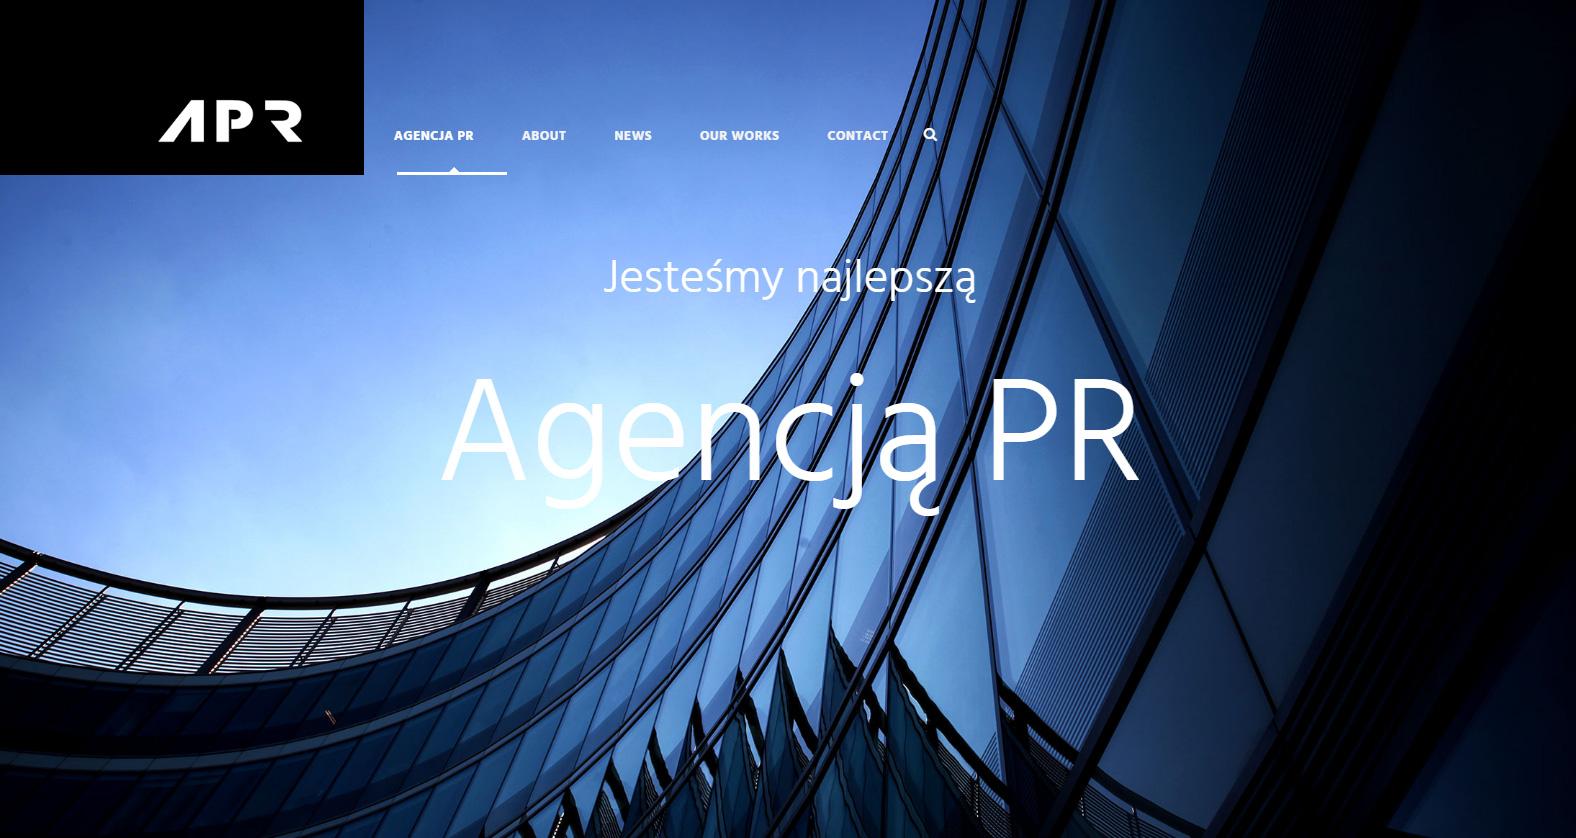 Agencja-PR-public-relations-activities-Warszawa3